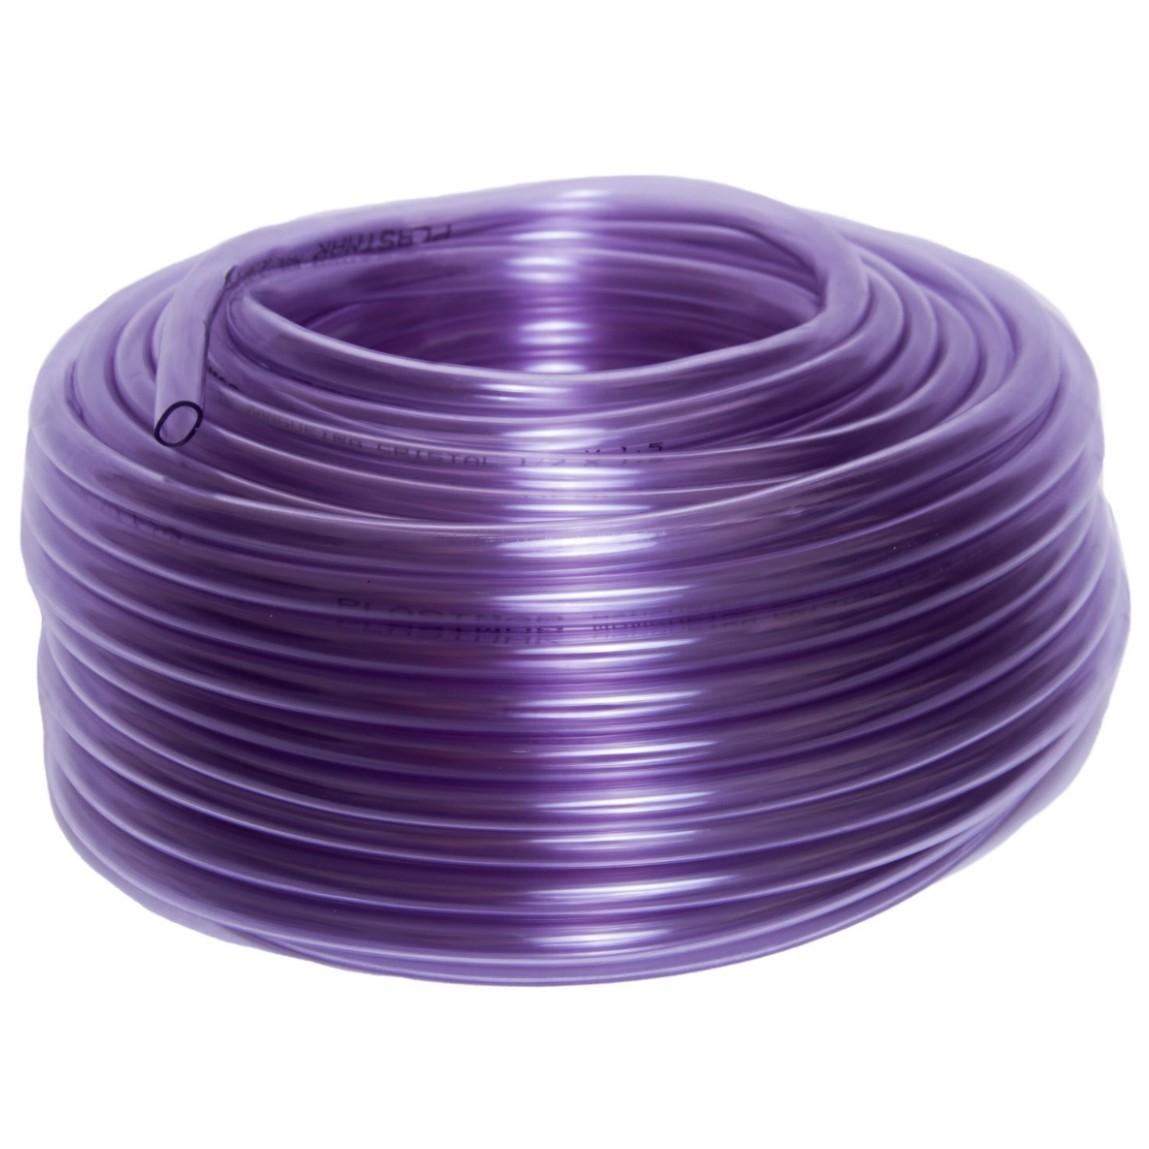 Mangueira de PVC 20m 14 Roxa 790 - Plastmar